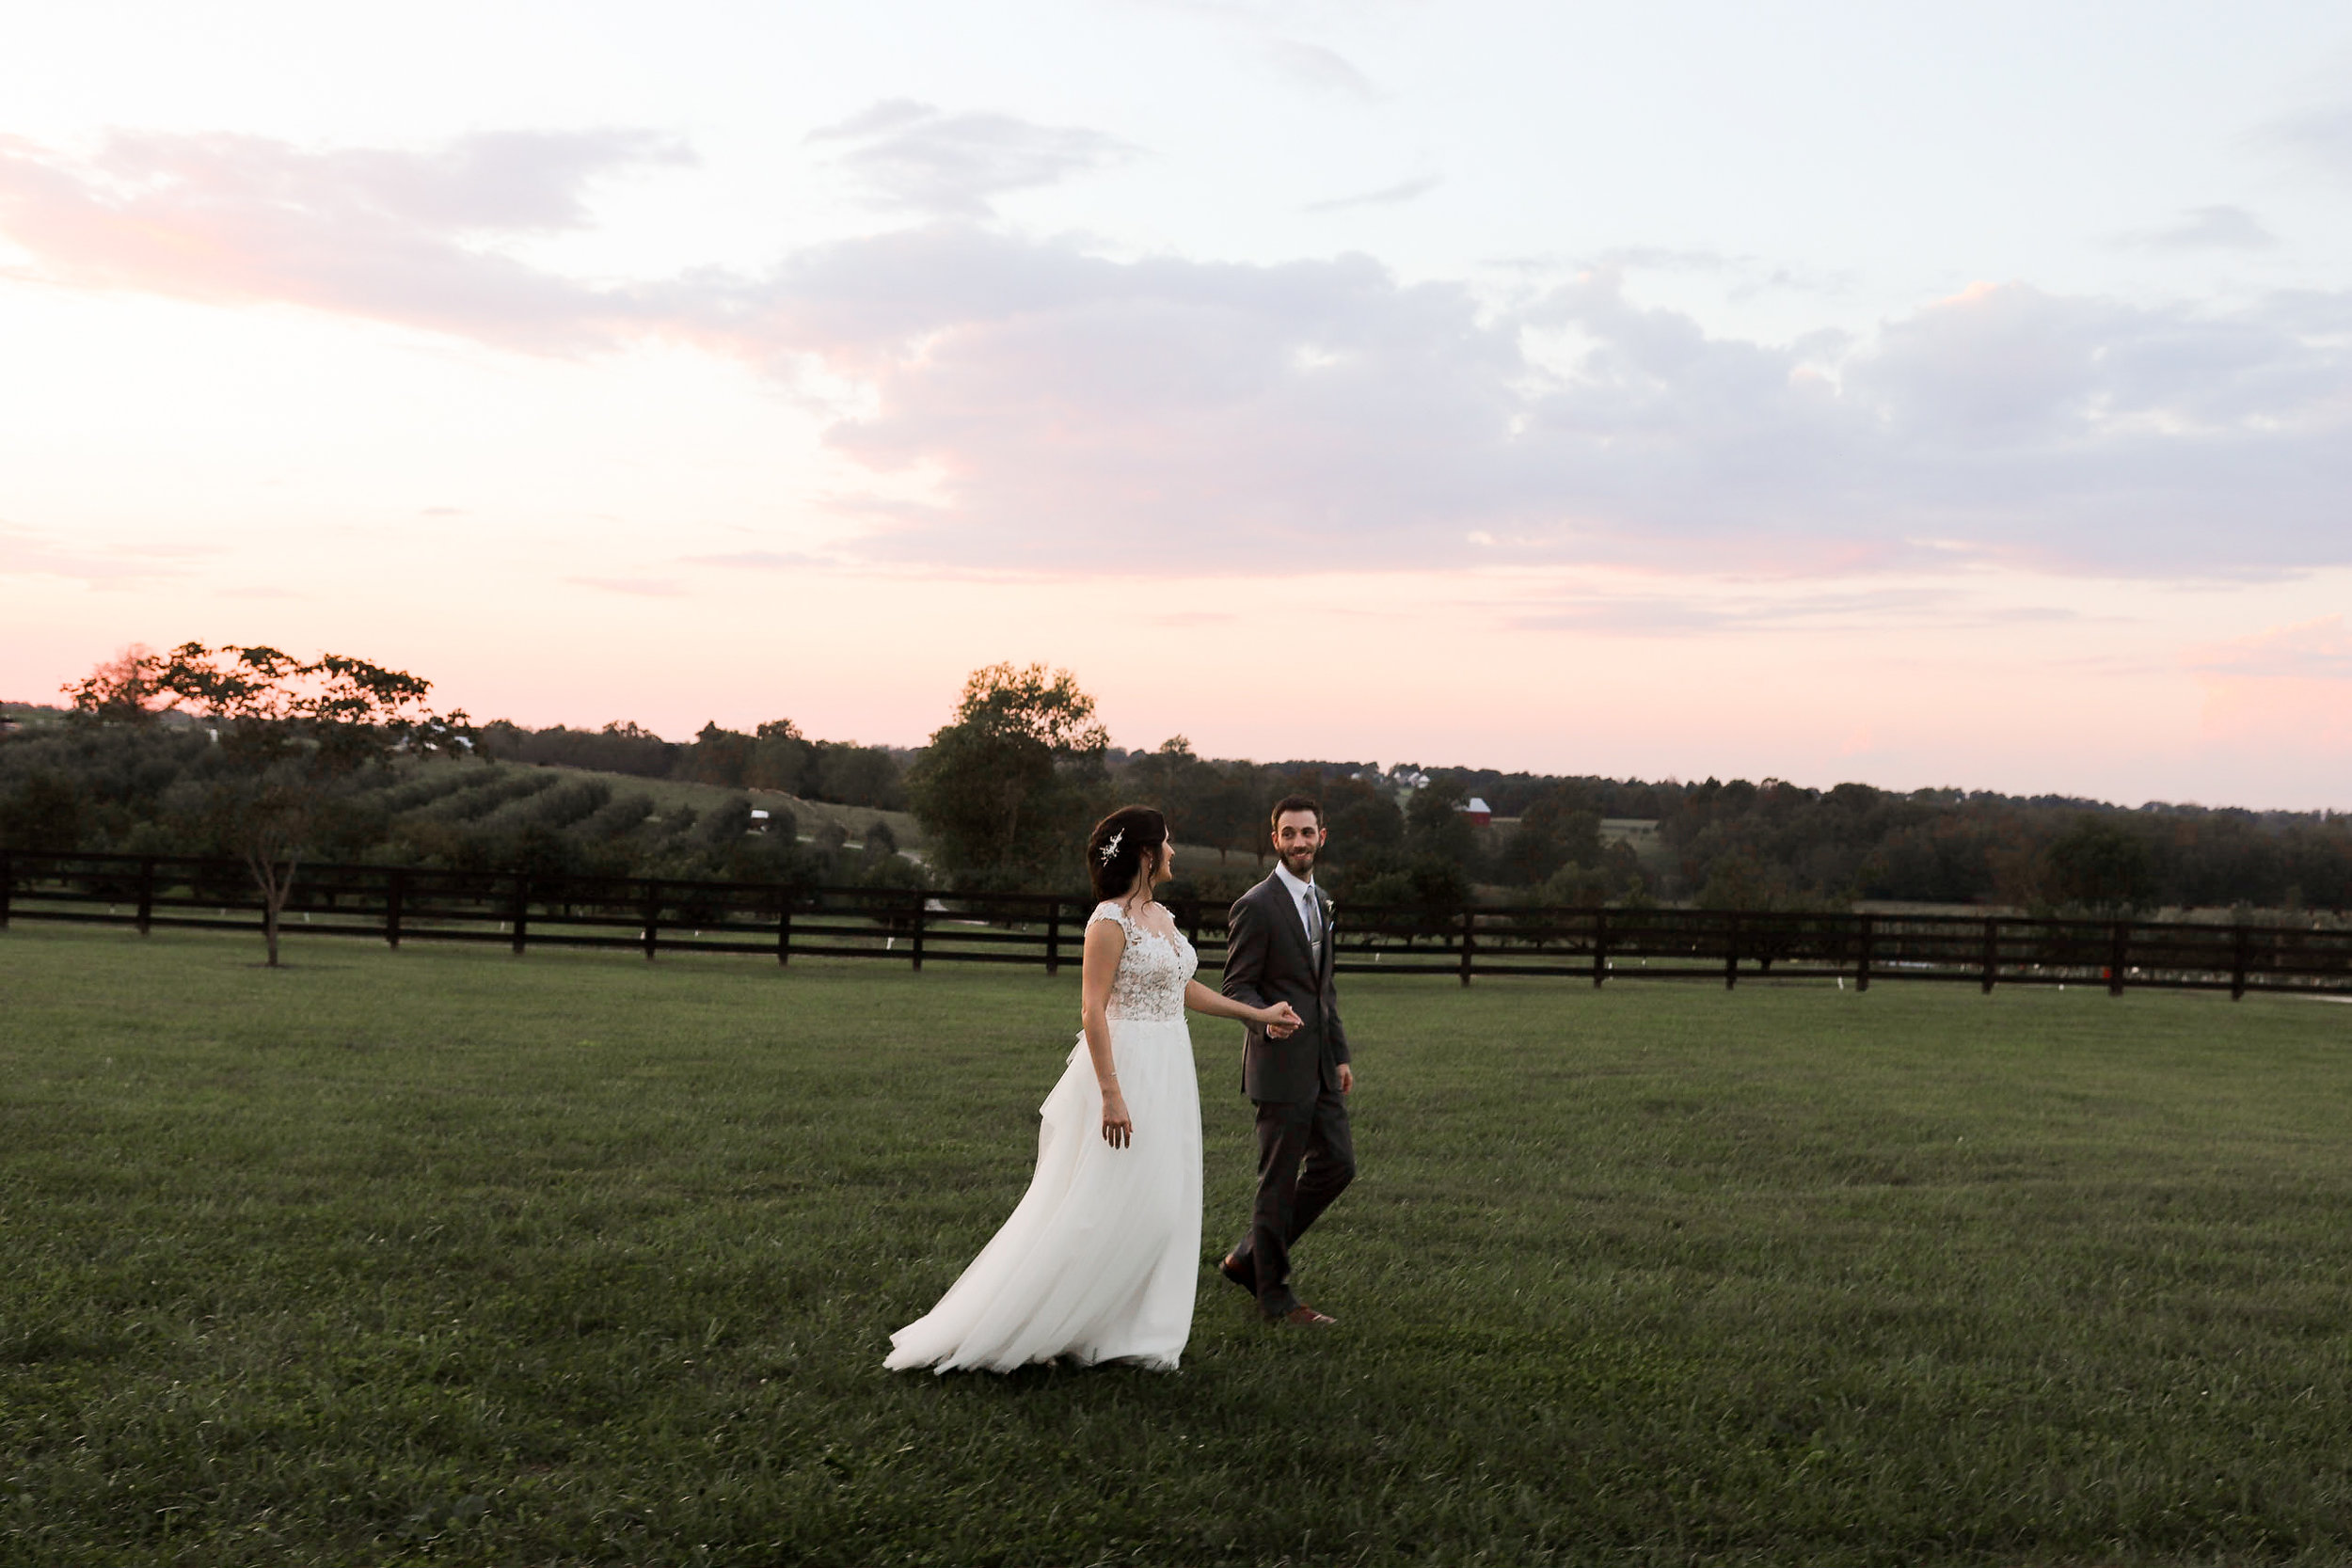 Evans-Orchard-Lexington-Kentucky-Fall-Wedding-32.jpg